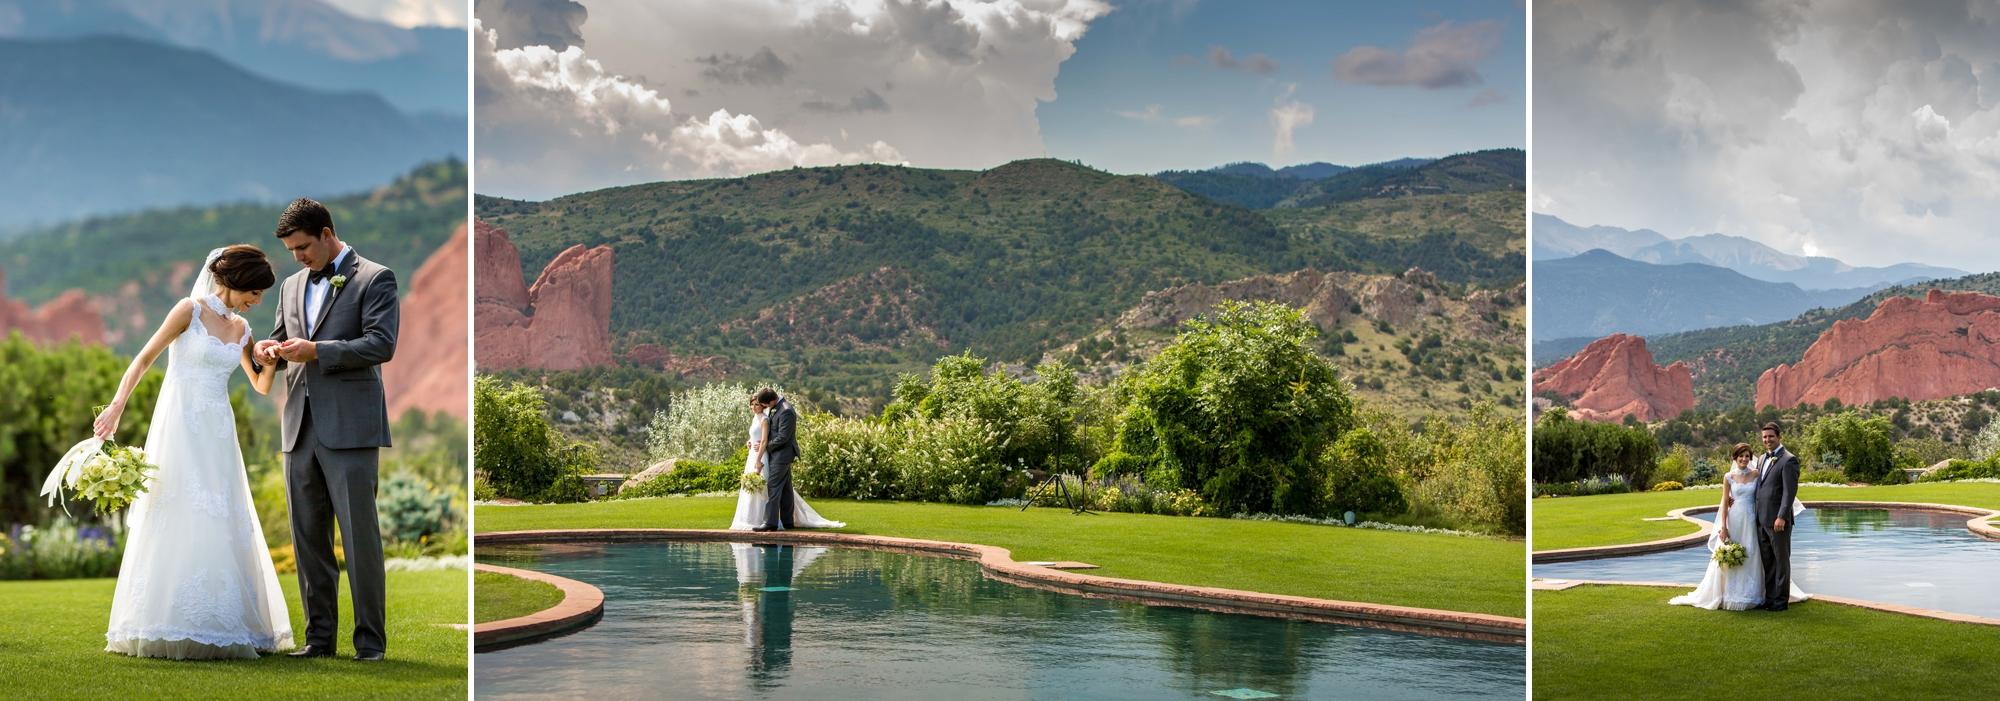 Garden of the Gods Country Club, Colorado Springs Wedding